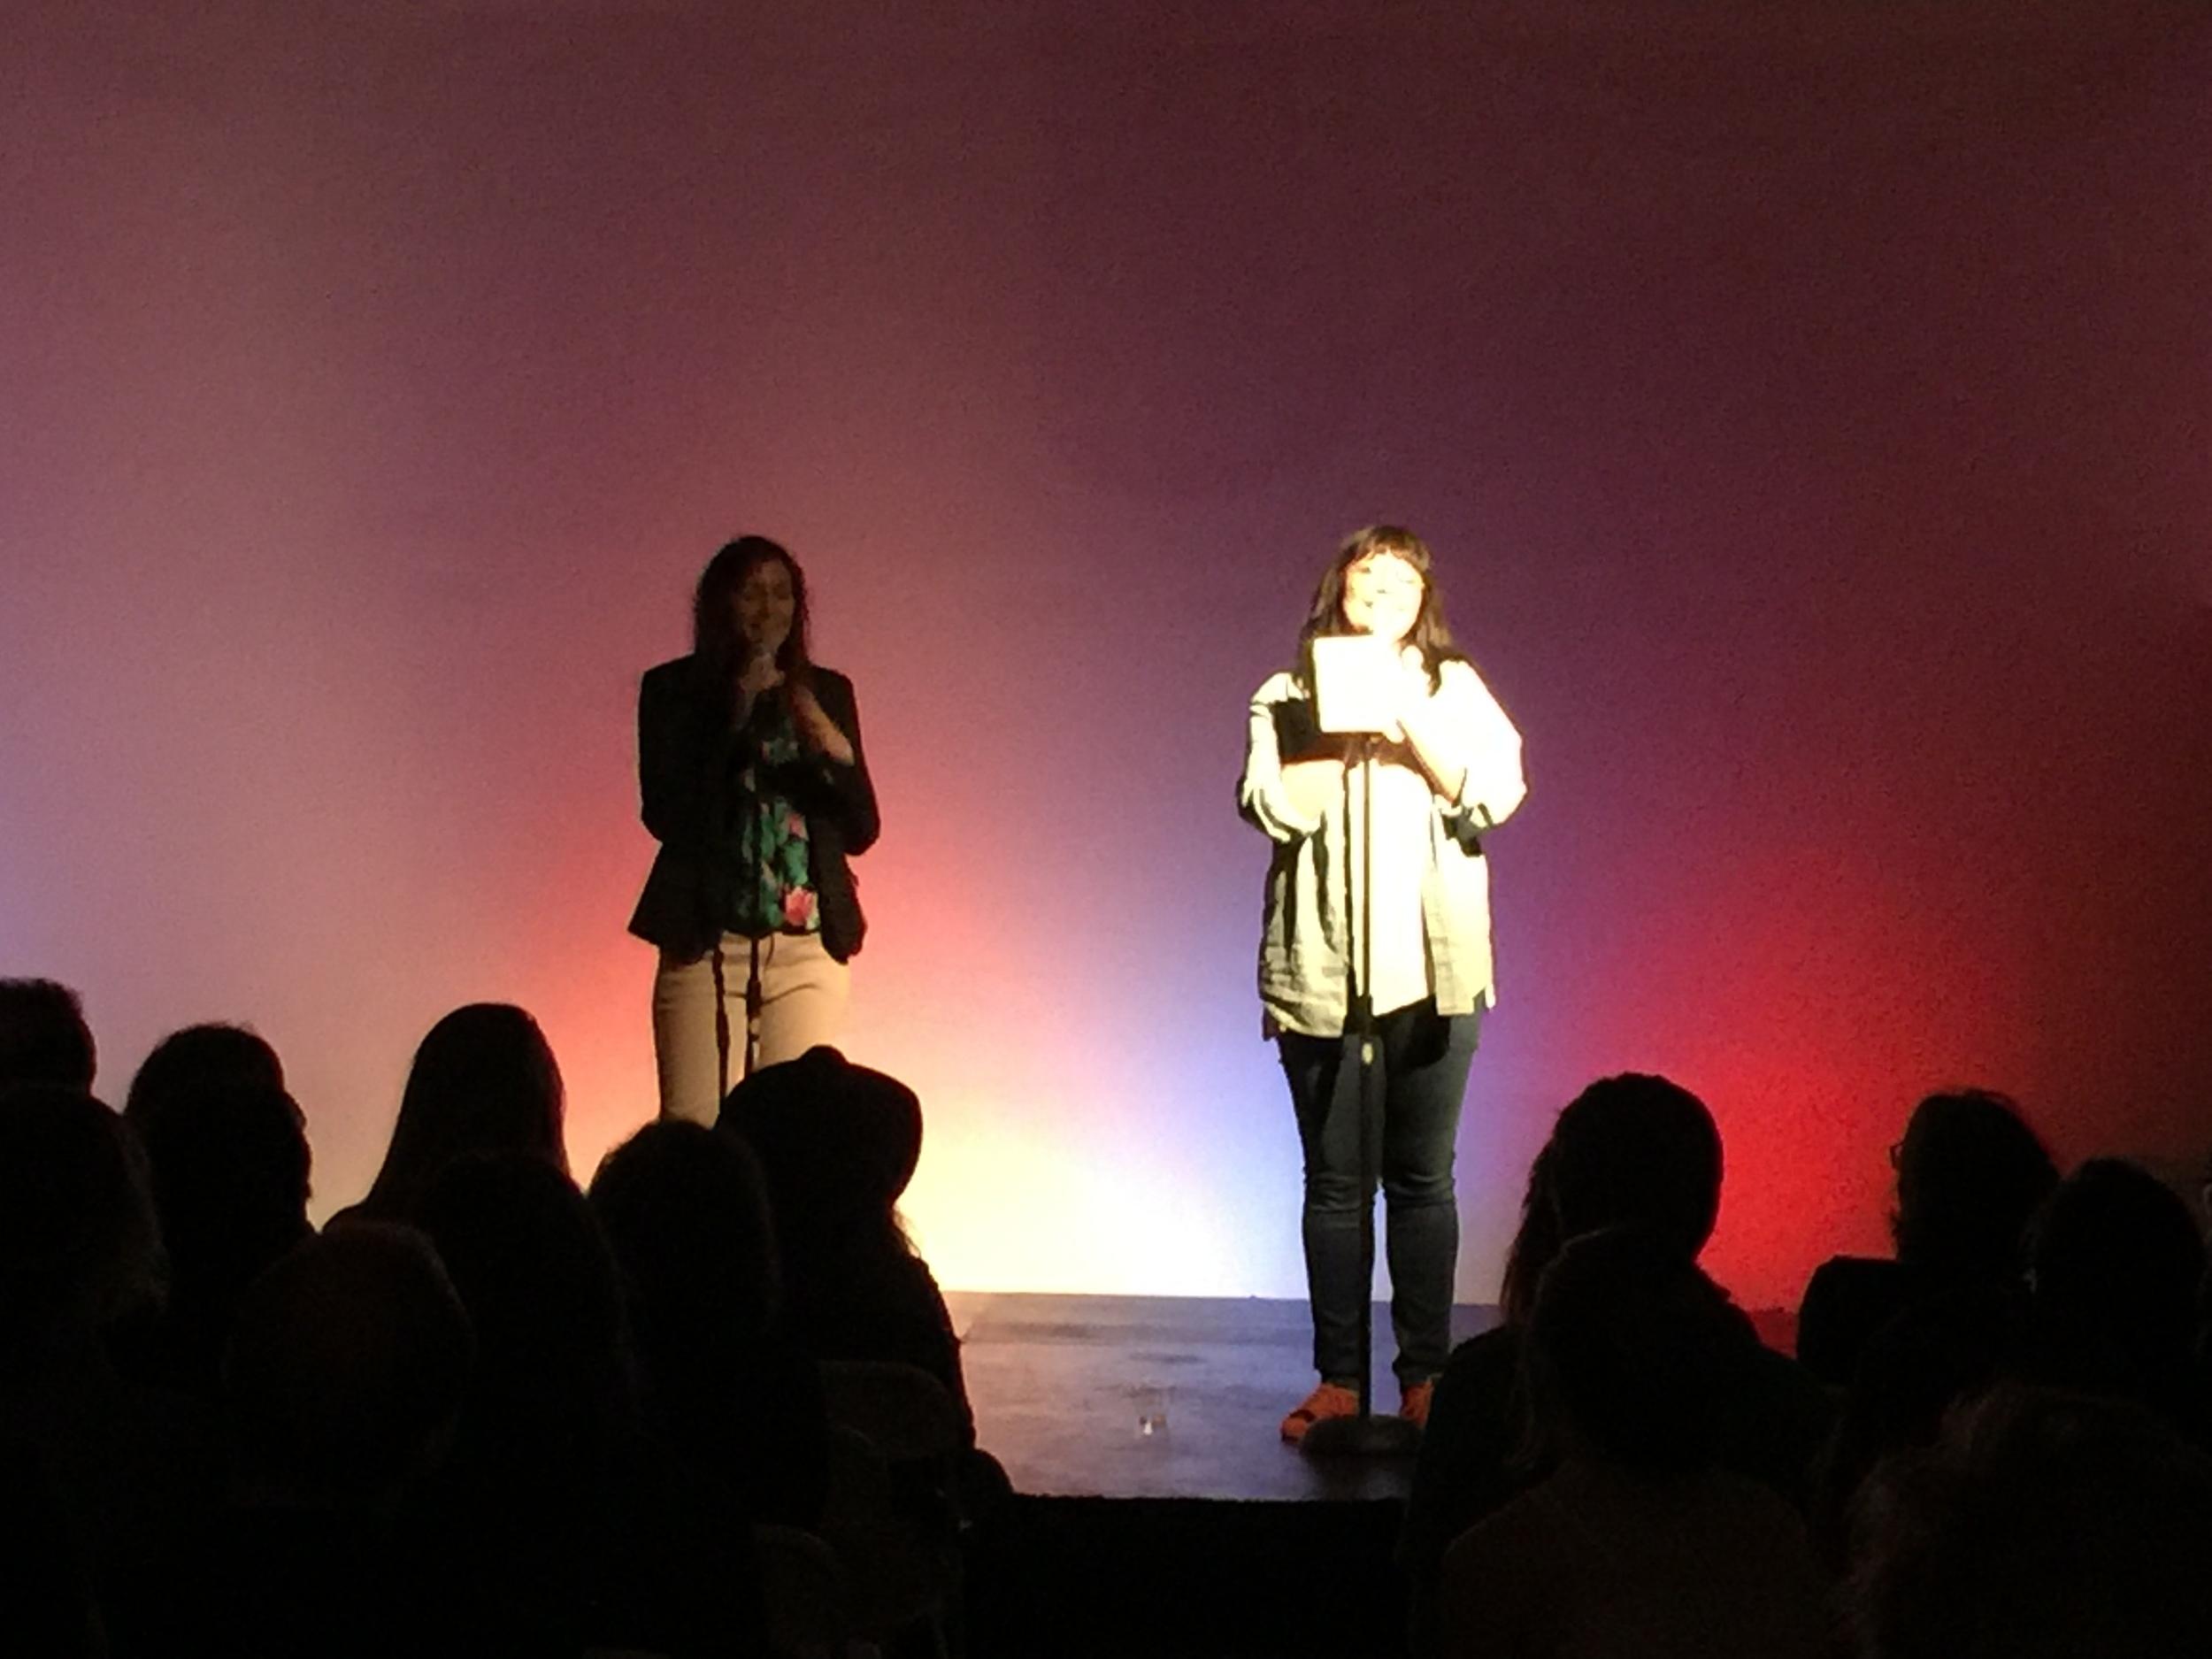 Nikki Pierce and Mary Hollis Inboden, 10.7